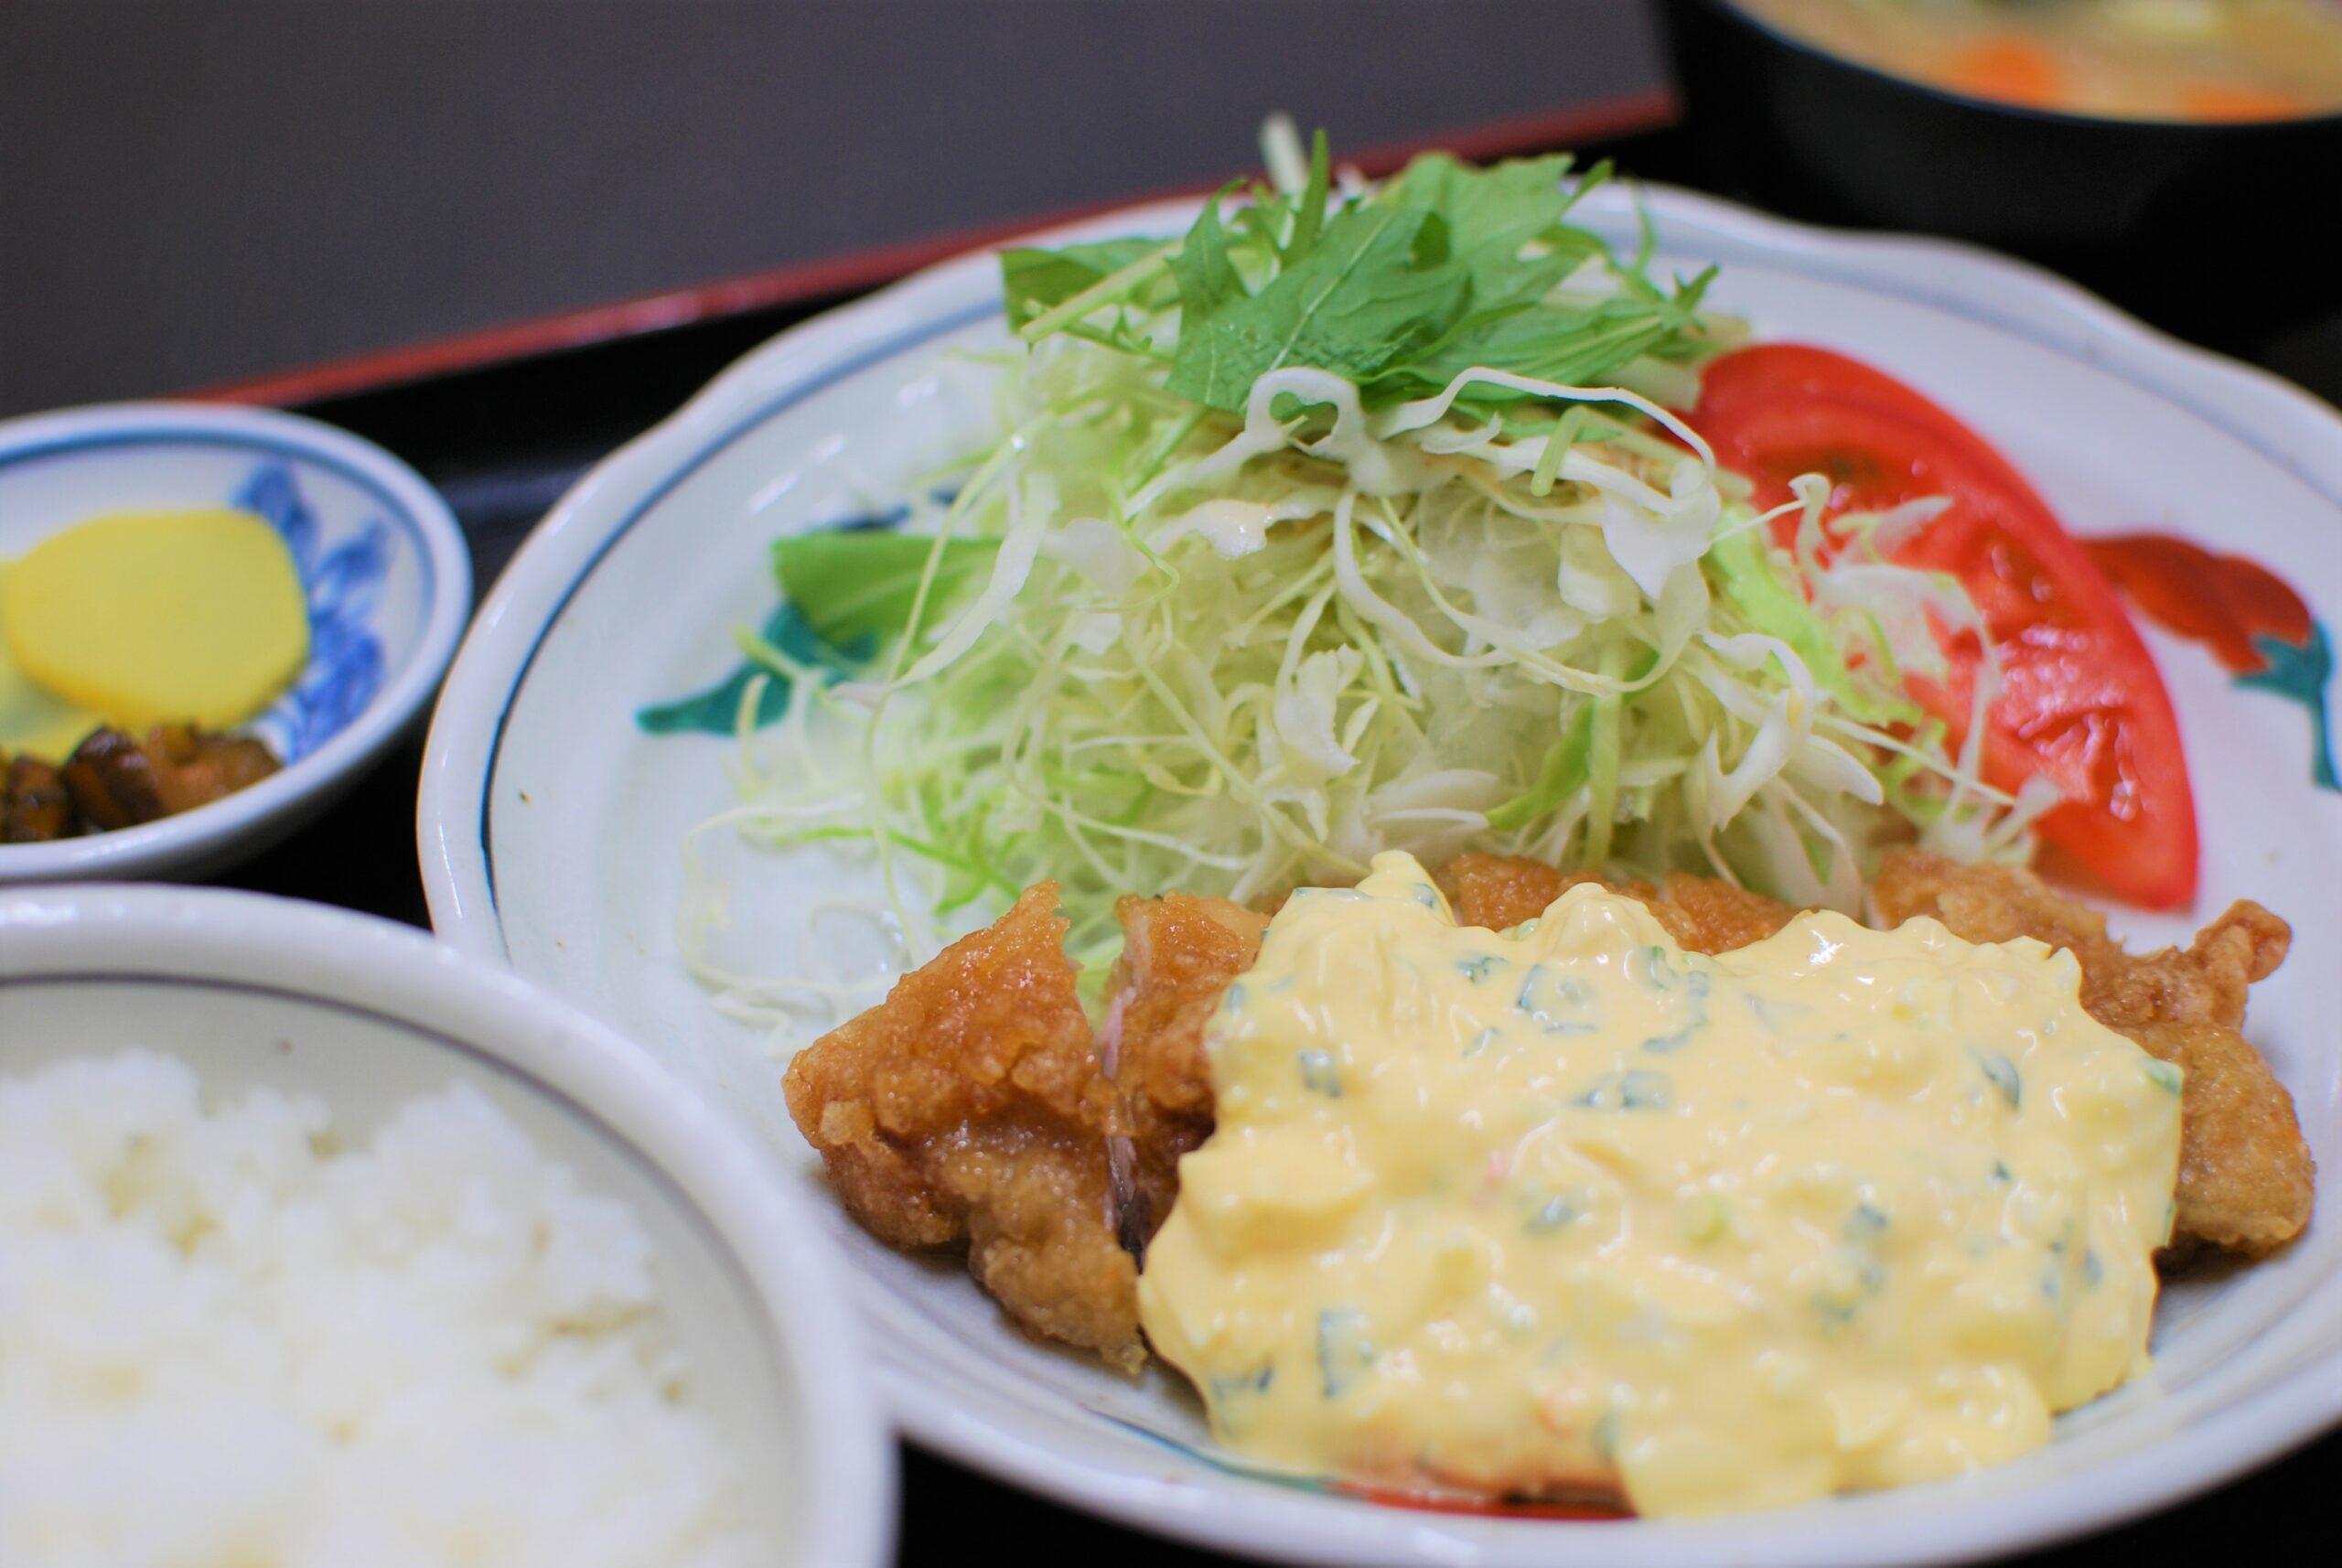 鶏南蛮定食の写真